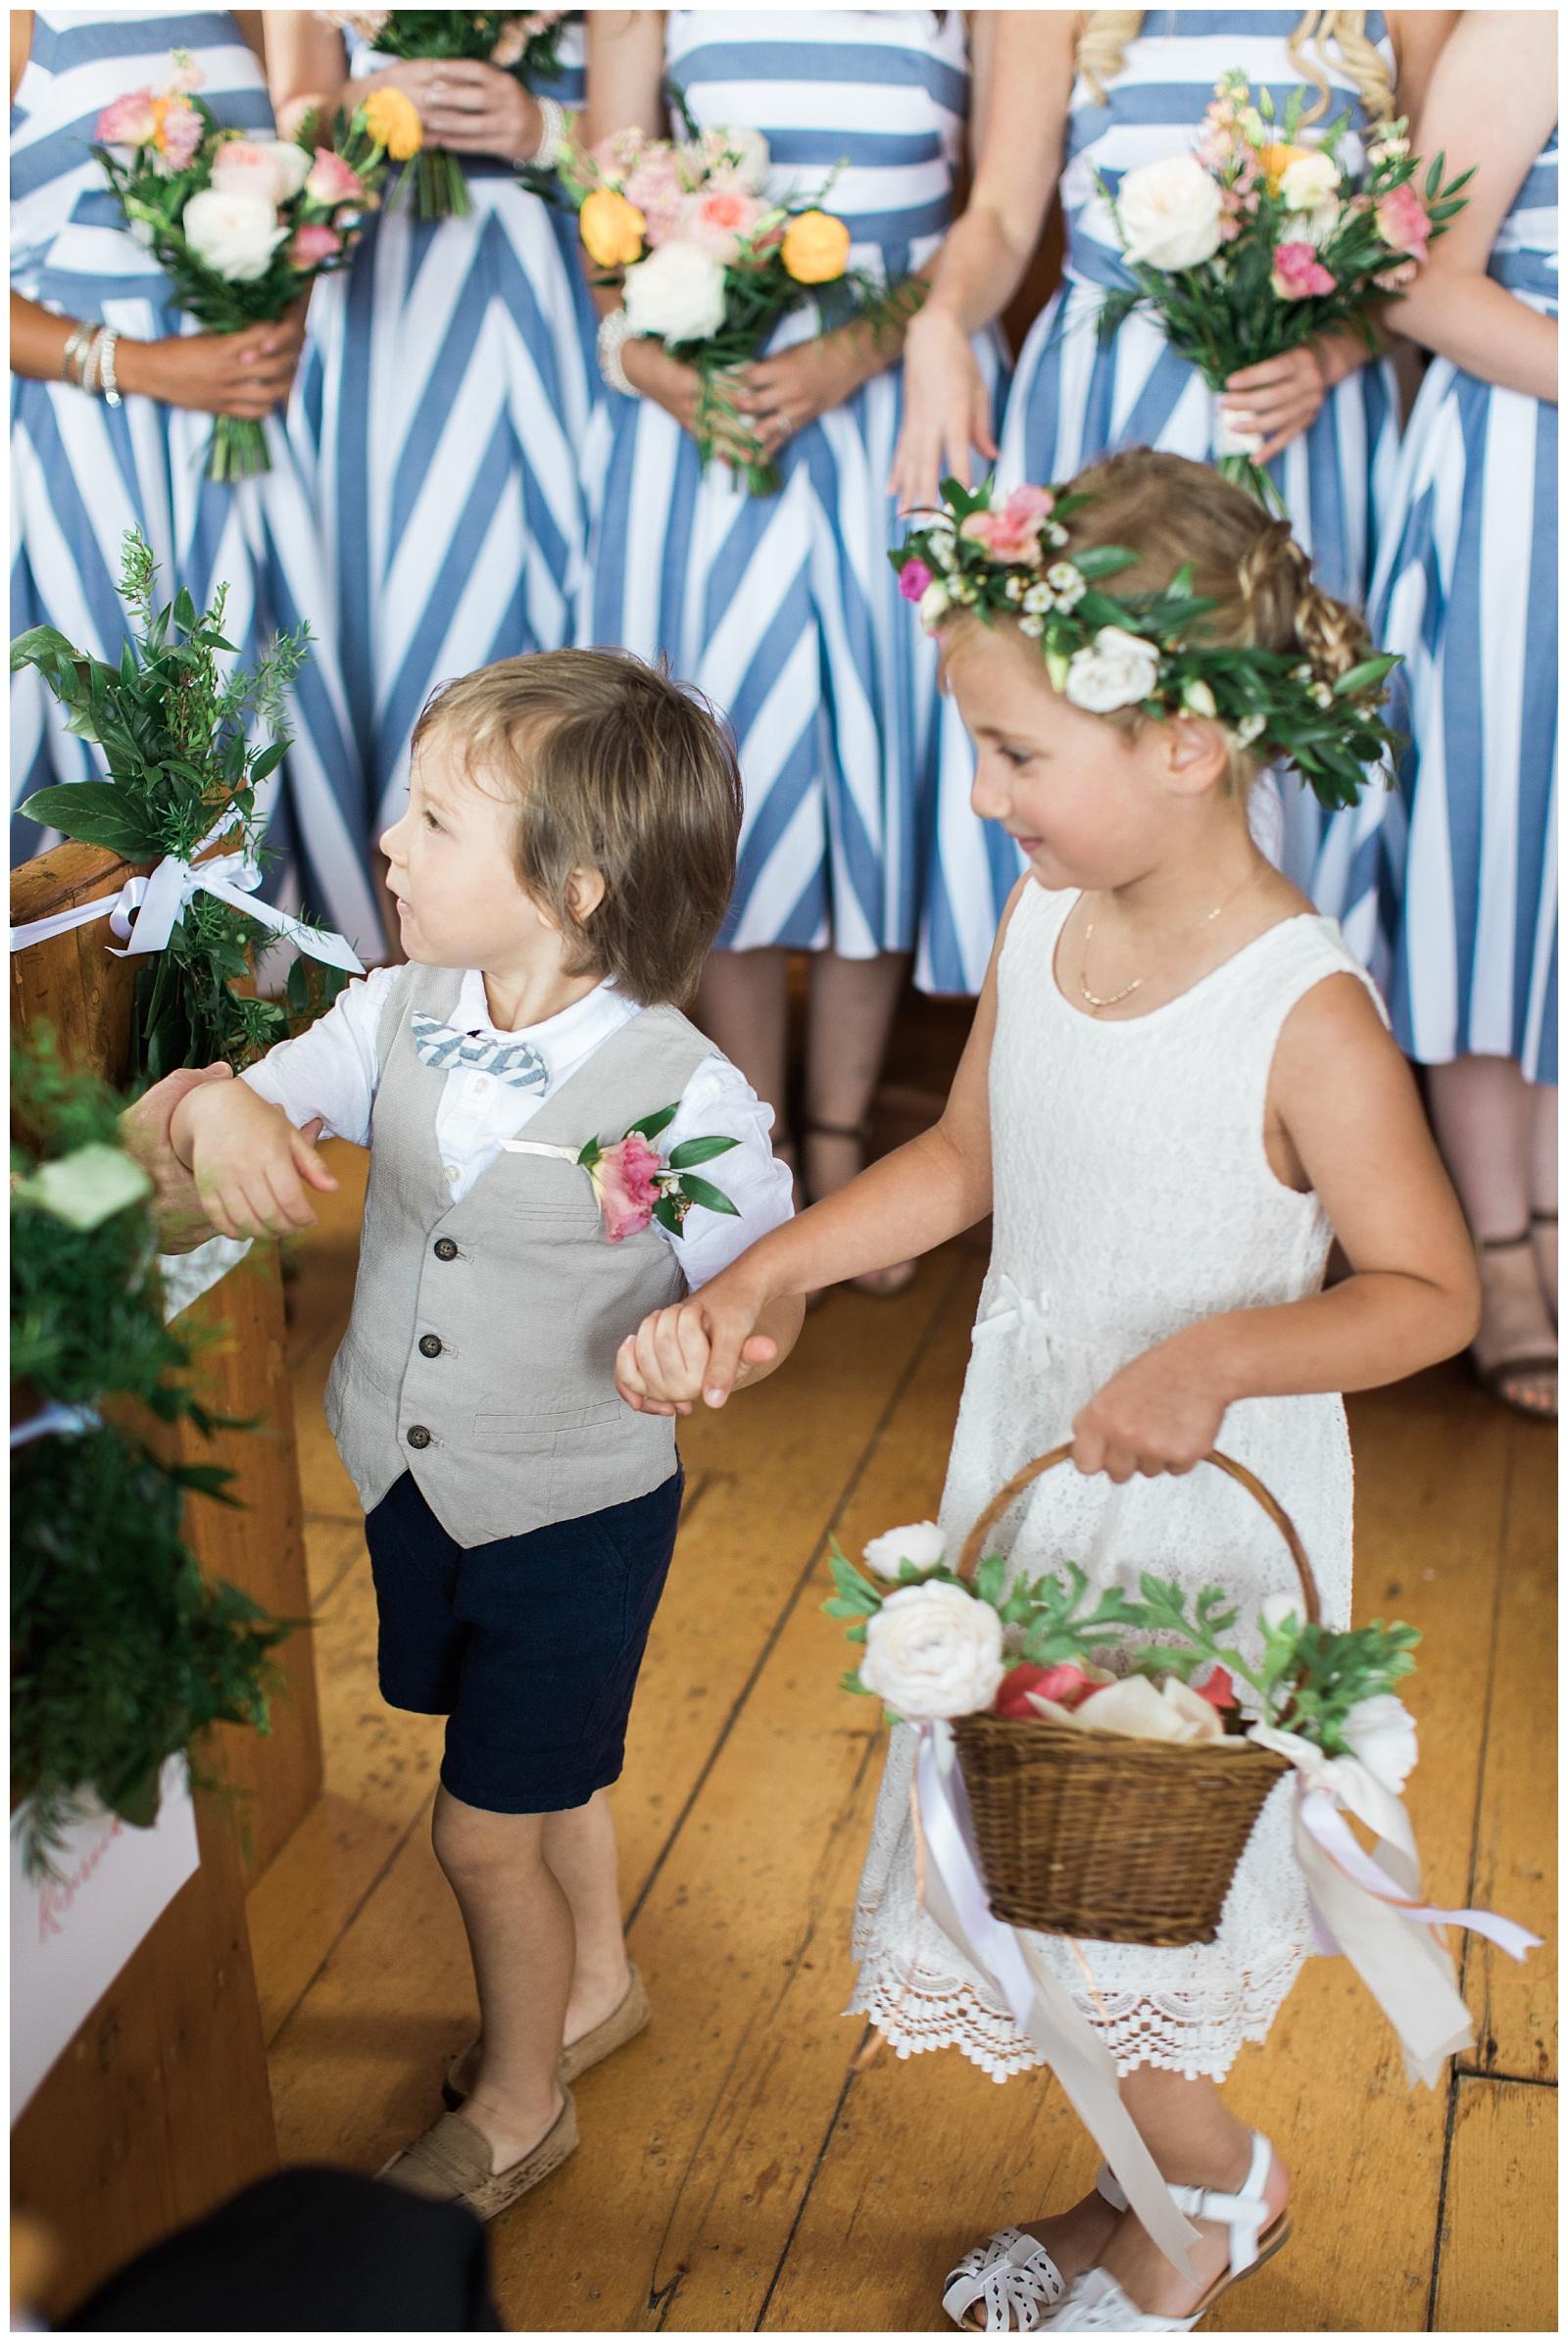 Flower girl and ring bearer walking down aisle at Guelph Ontario Wedding | Ontario Wedding Photographer | Toronto Wedding Photographer | 3photography